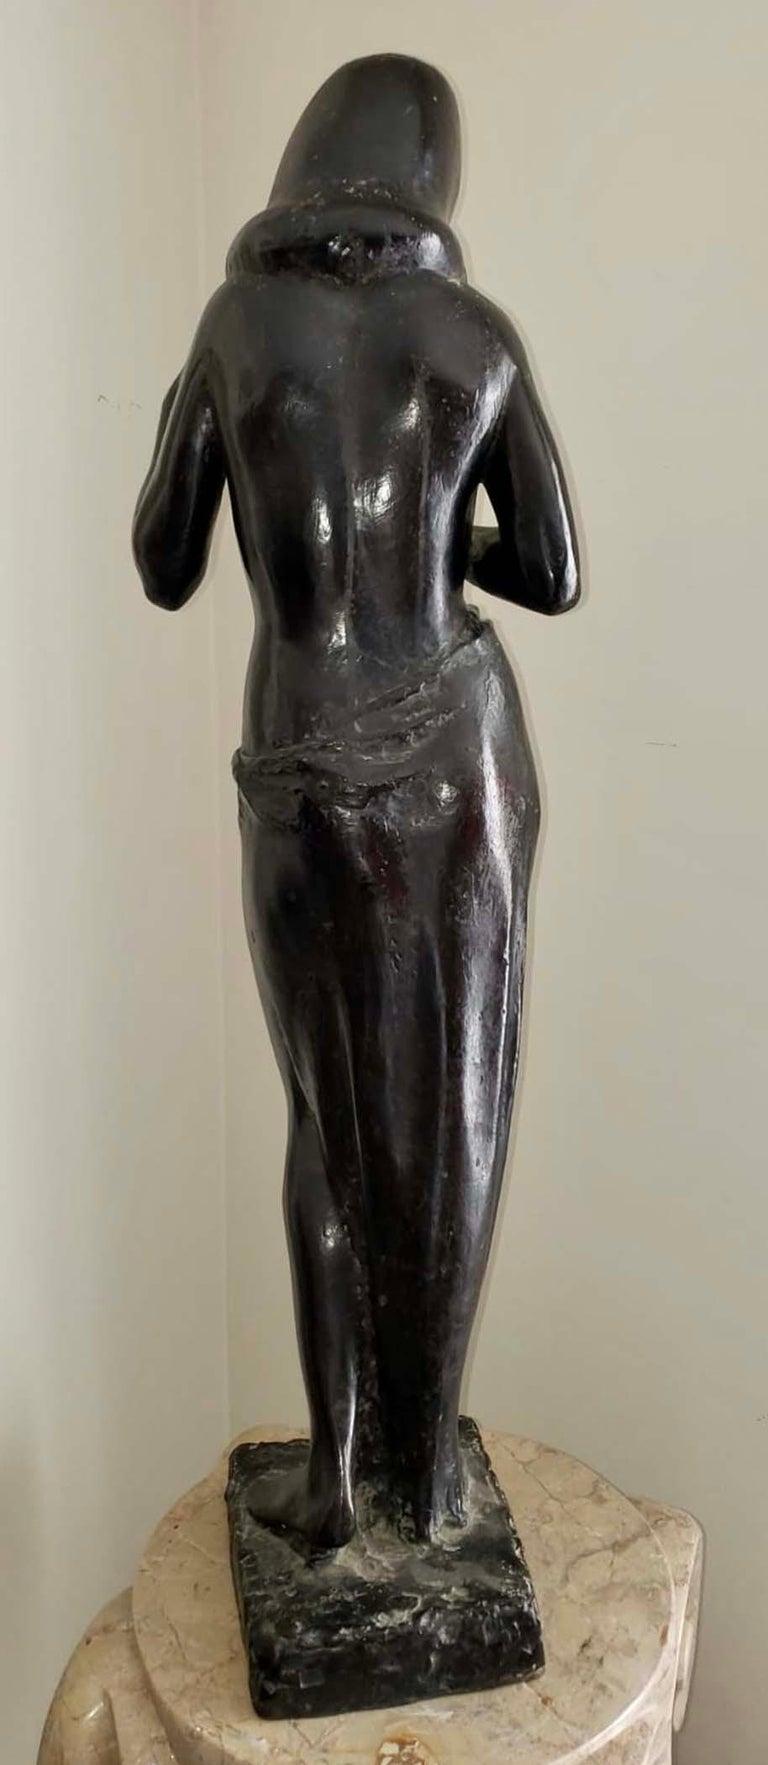 Venus - Art Deco Sculpture by Guy Charles Revol